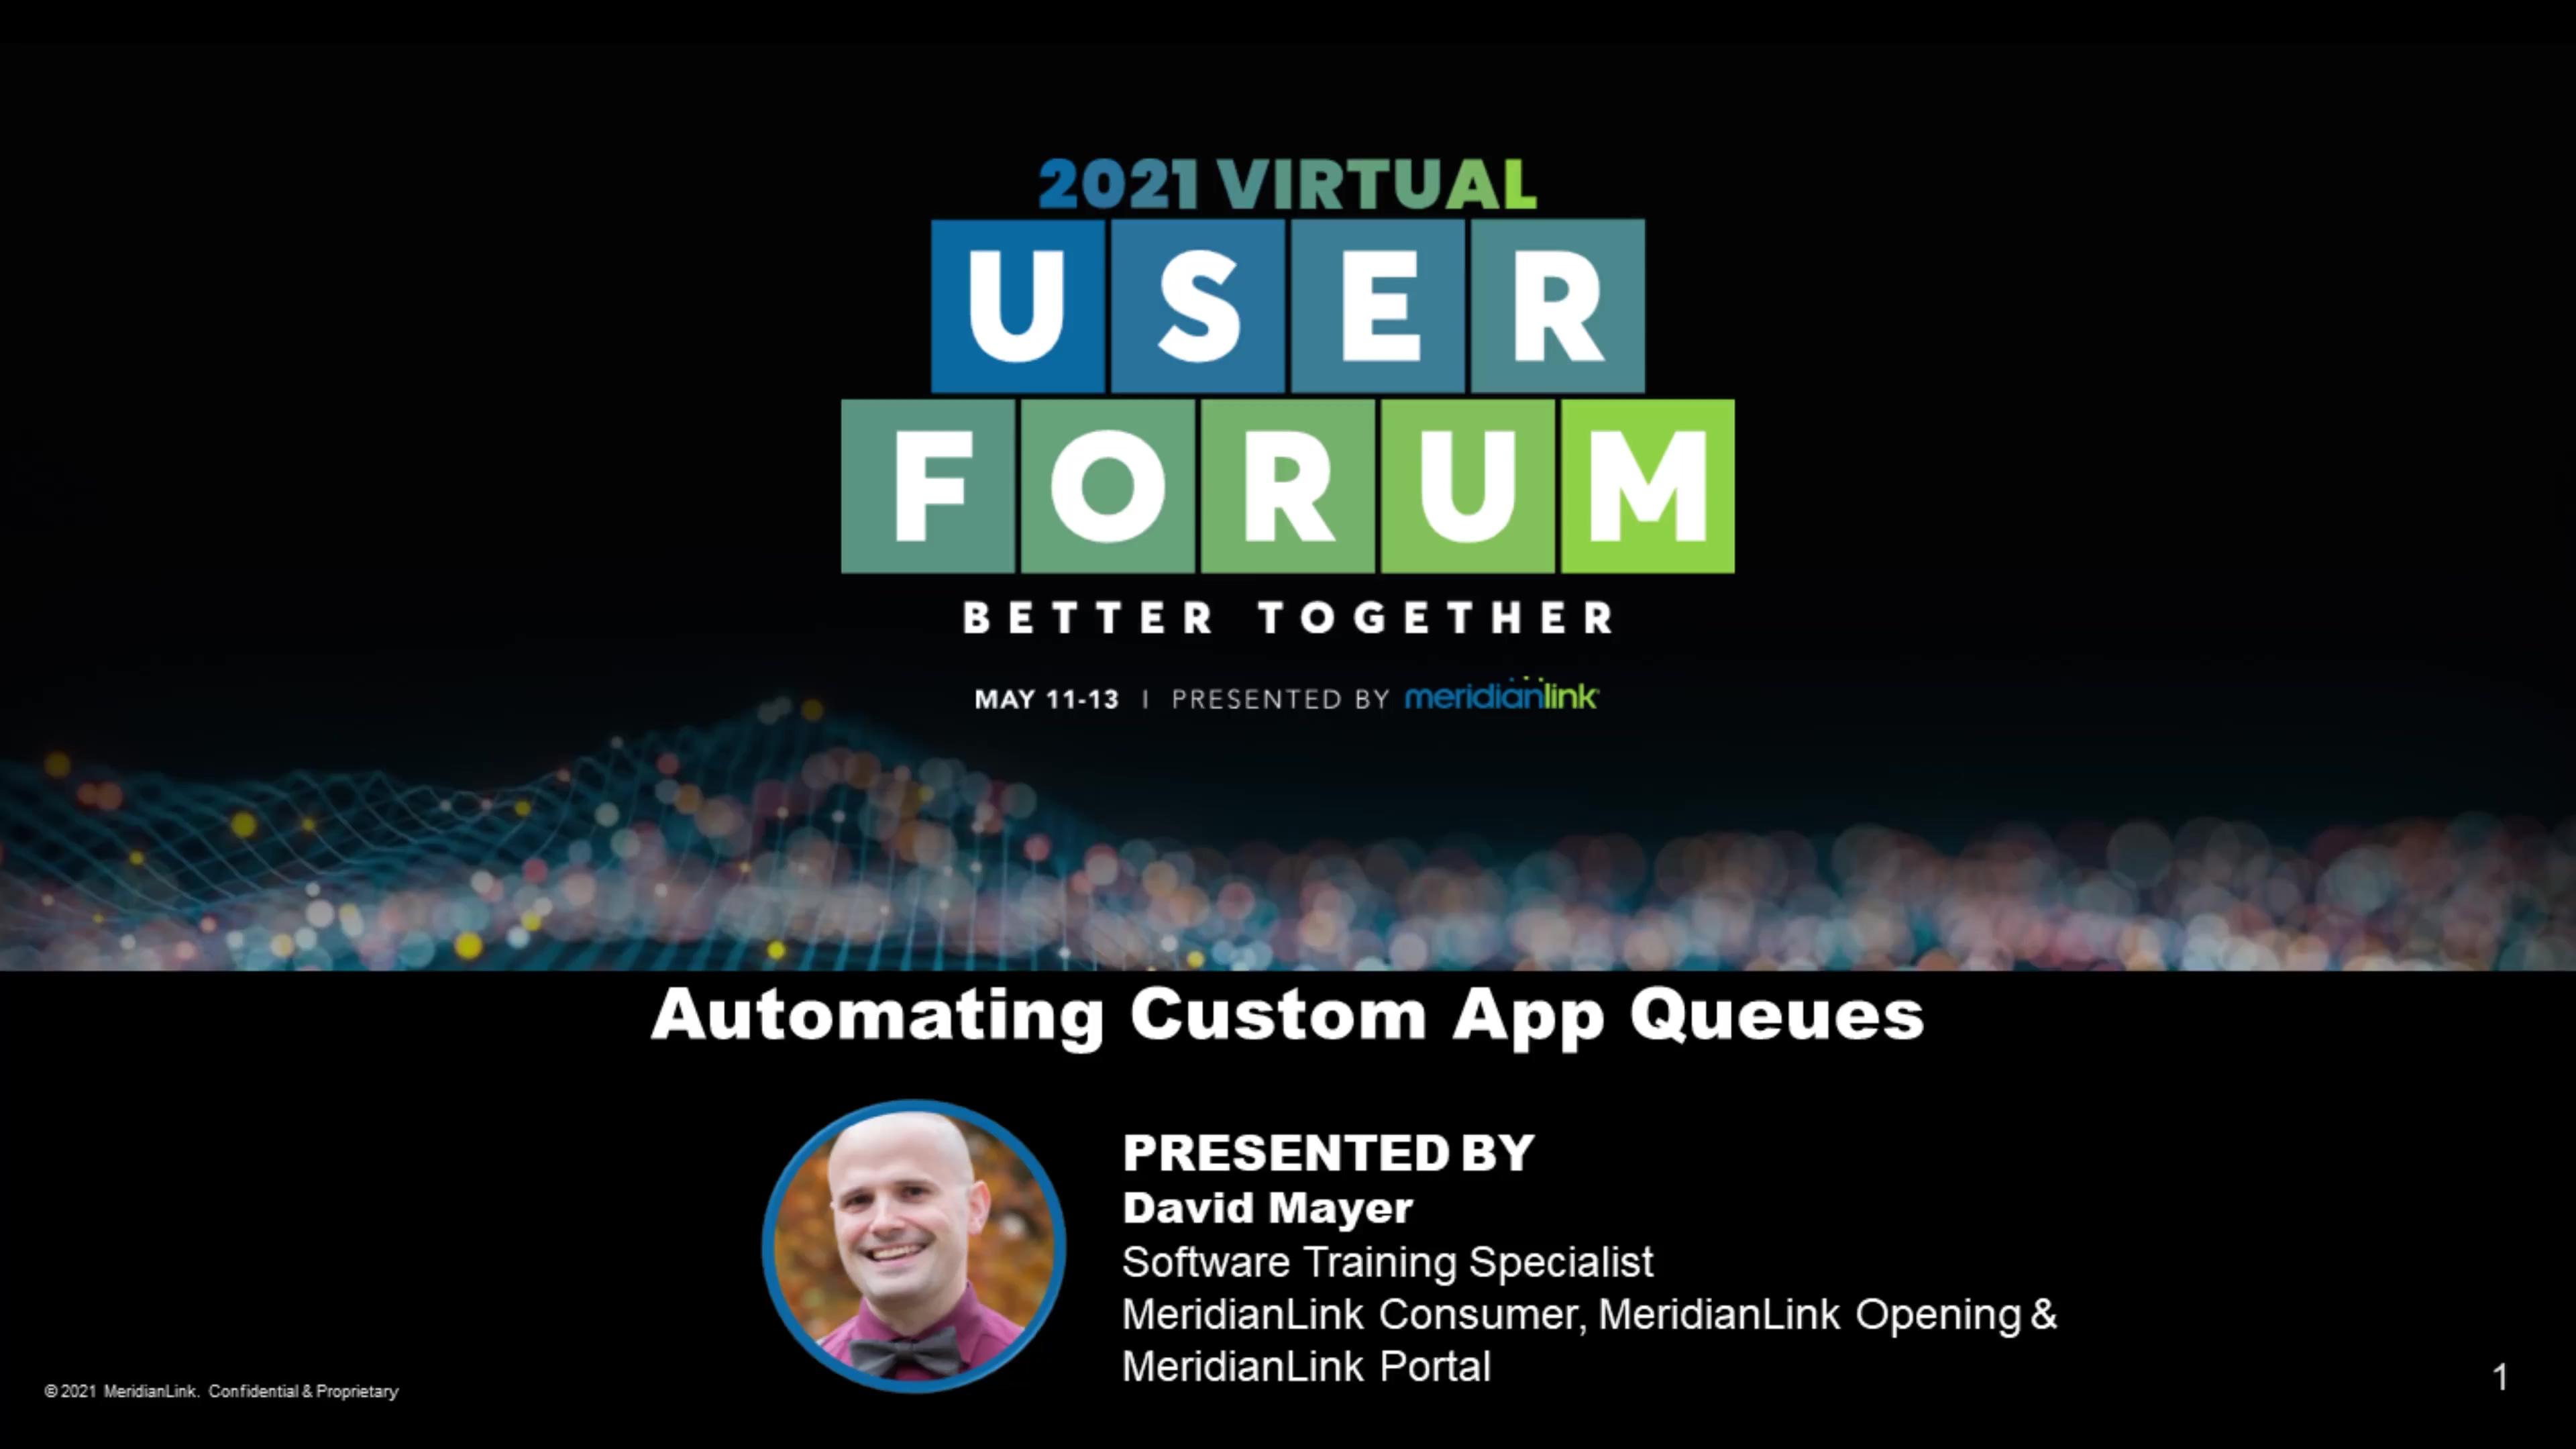 Automating Custom App Queues